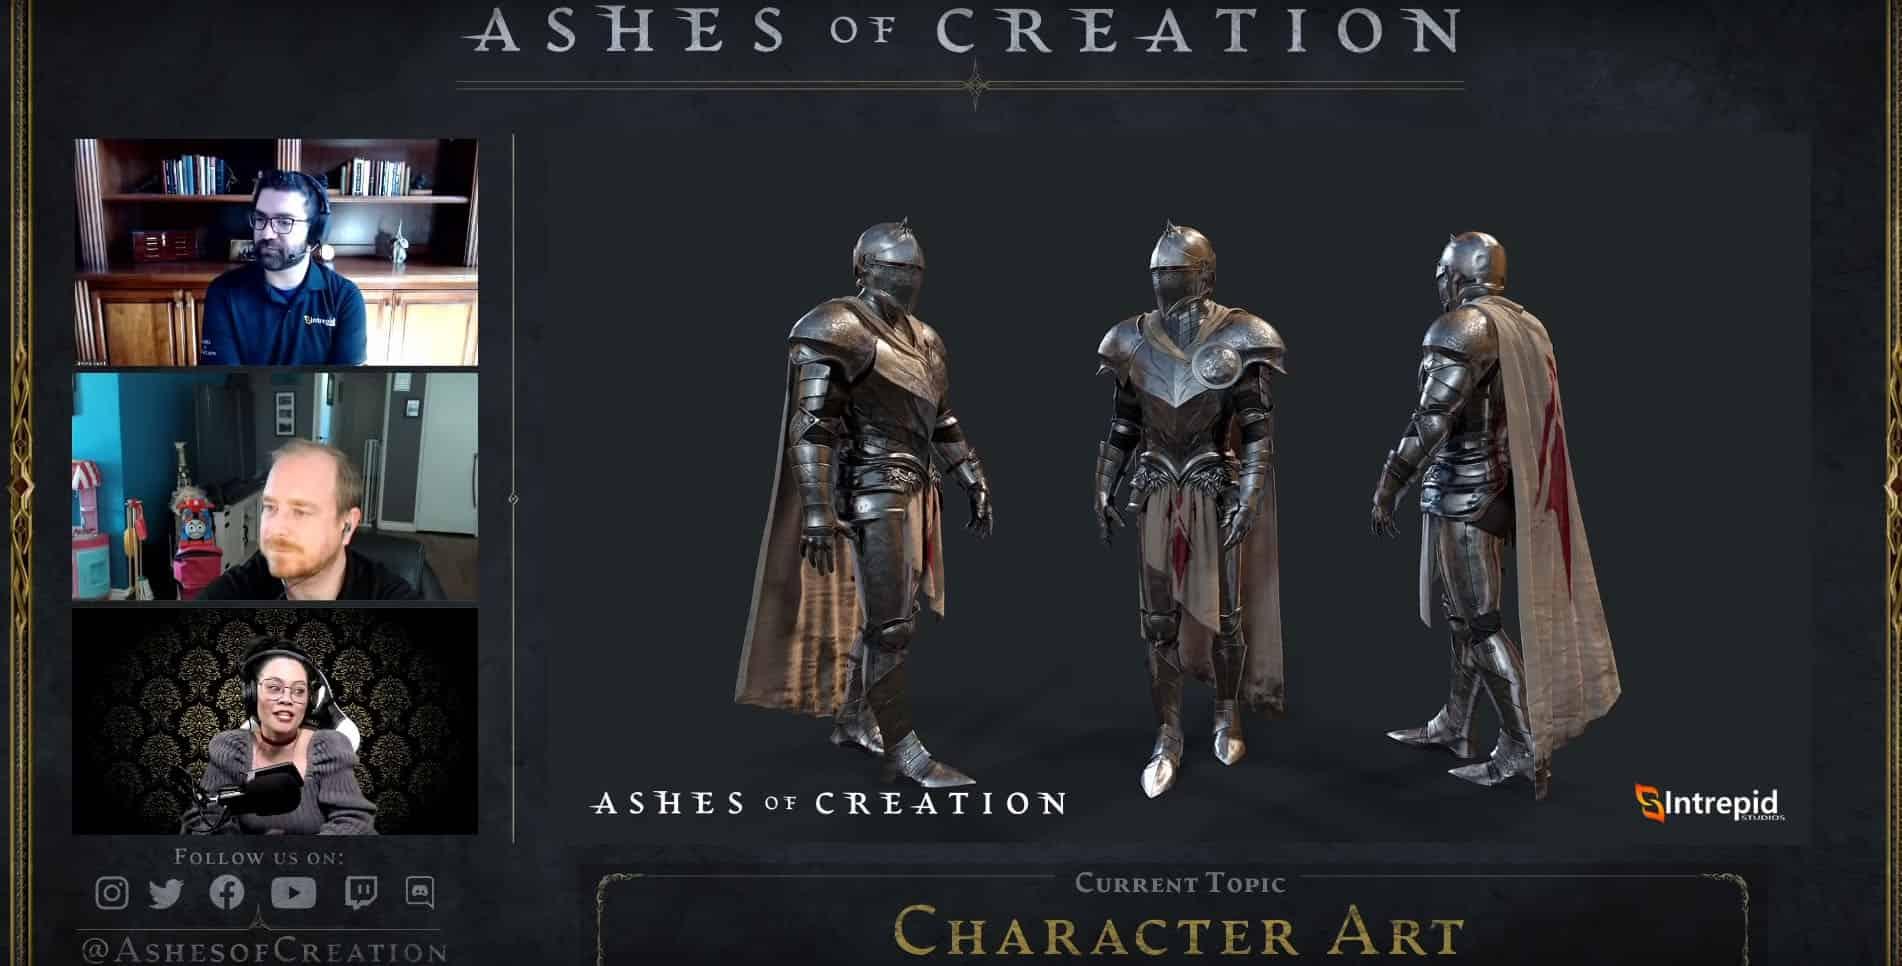 Ashes of Creation Development Update Talks Hiring, Website Design, Gameplay, And Art 3